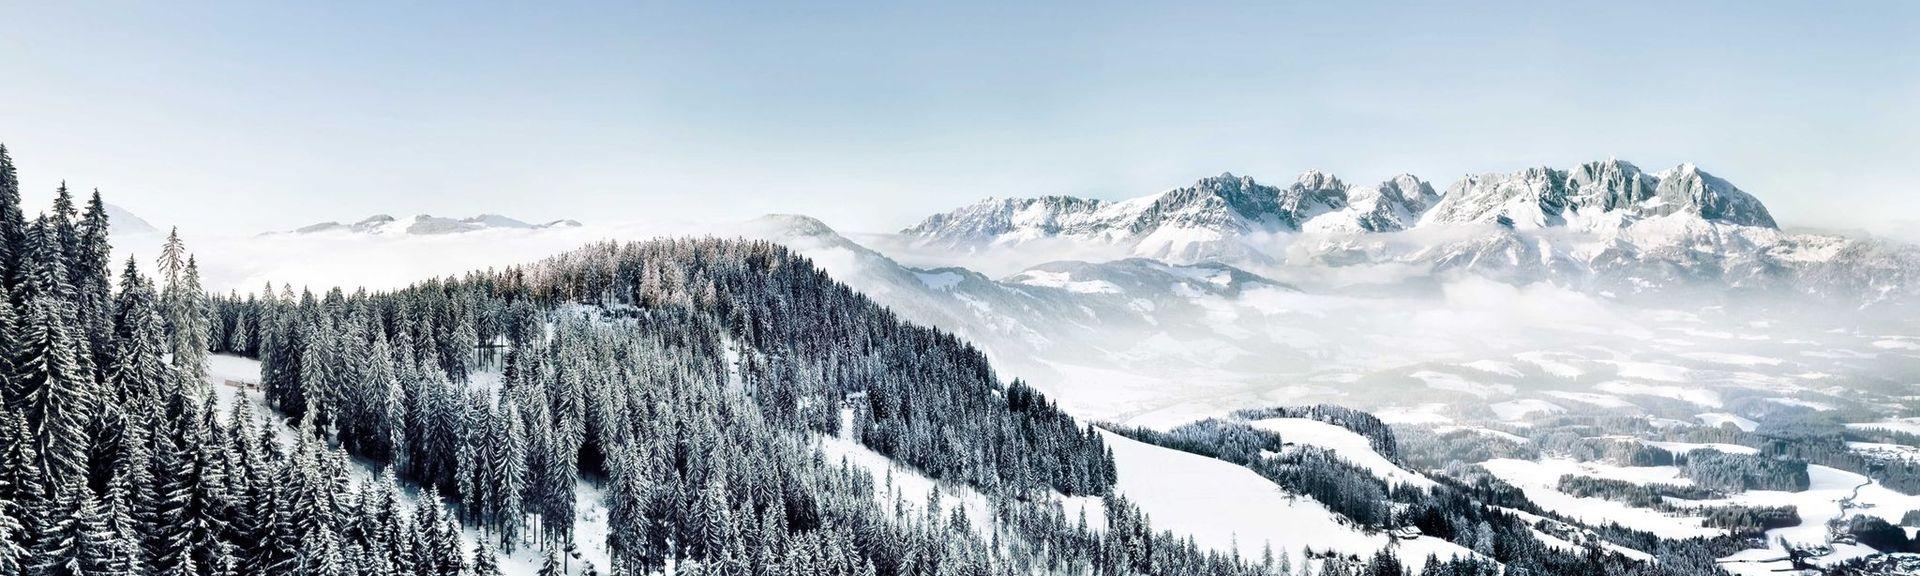 Saalbach-Hinterglemm skiområde, Saalbach-Hinterglemm, Salzburg (stat), Østerrike